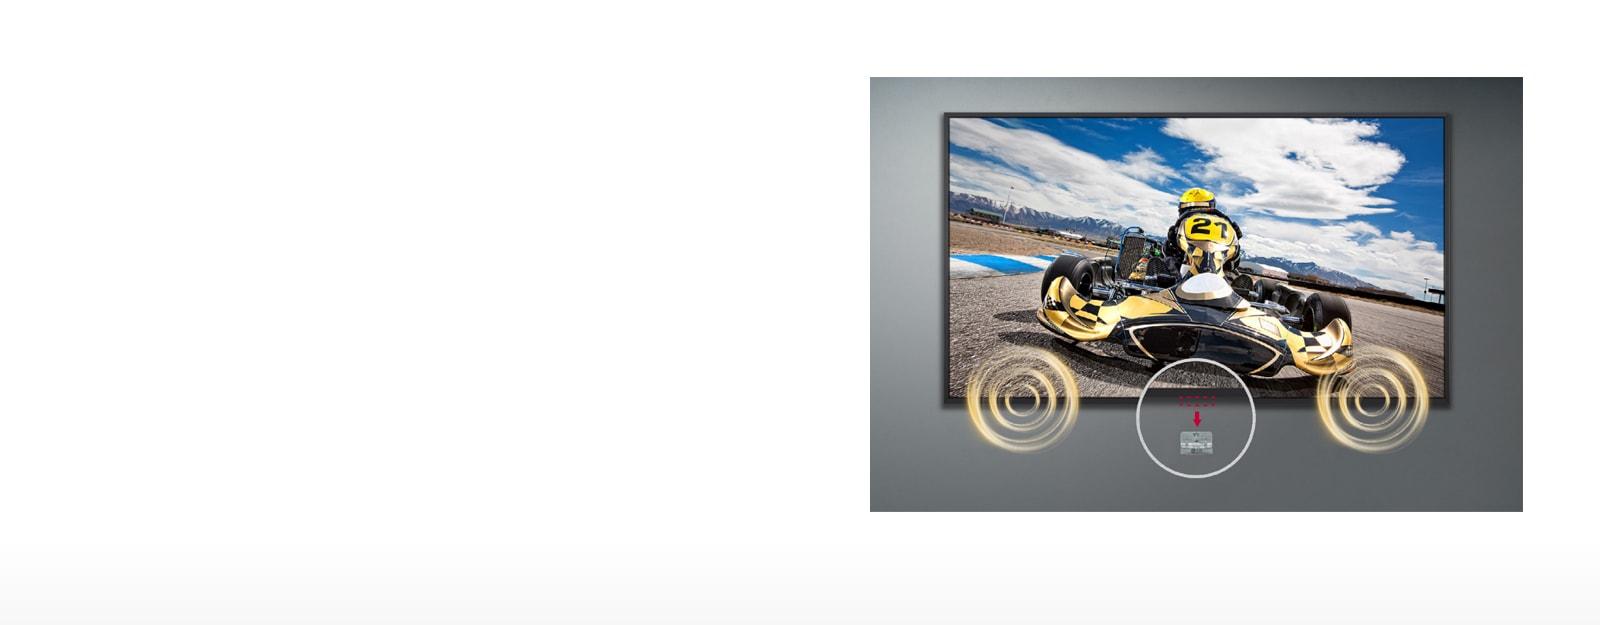 UH5F-B-05-Detachable Logo and Built-in Speaker-Standard Premium-Digital Signage-ID_1563923778600